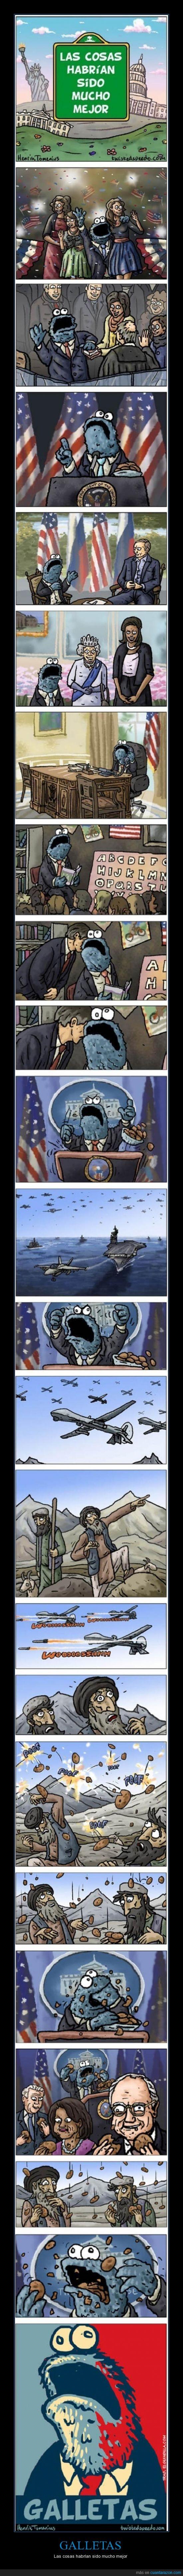 coco,Estado,Estados Unidos,Galletas,Guerra.,Monstruo,Politíca,Presidente